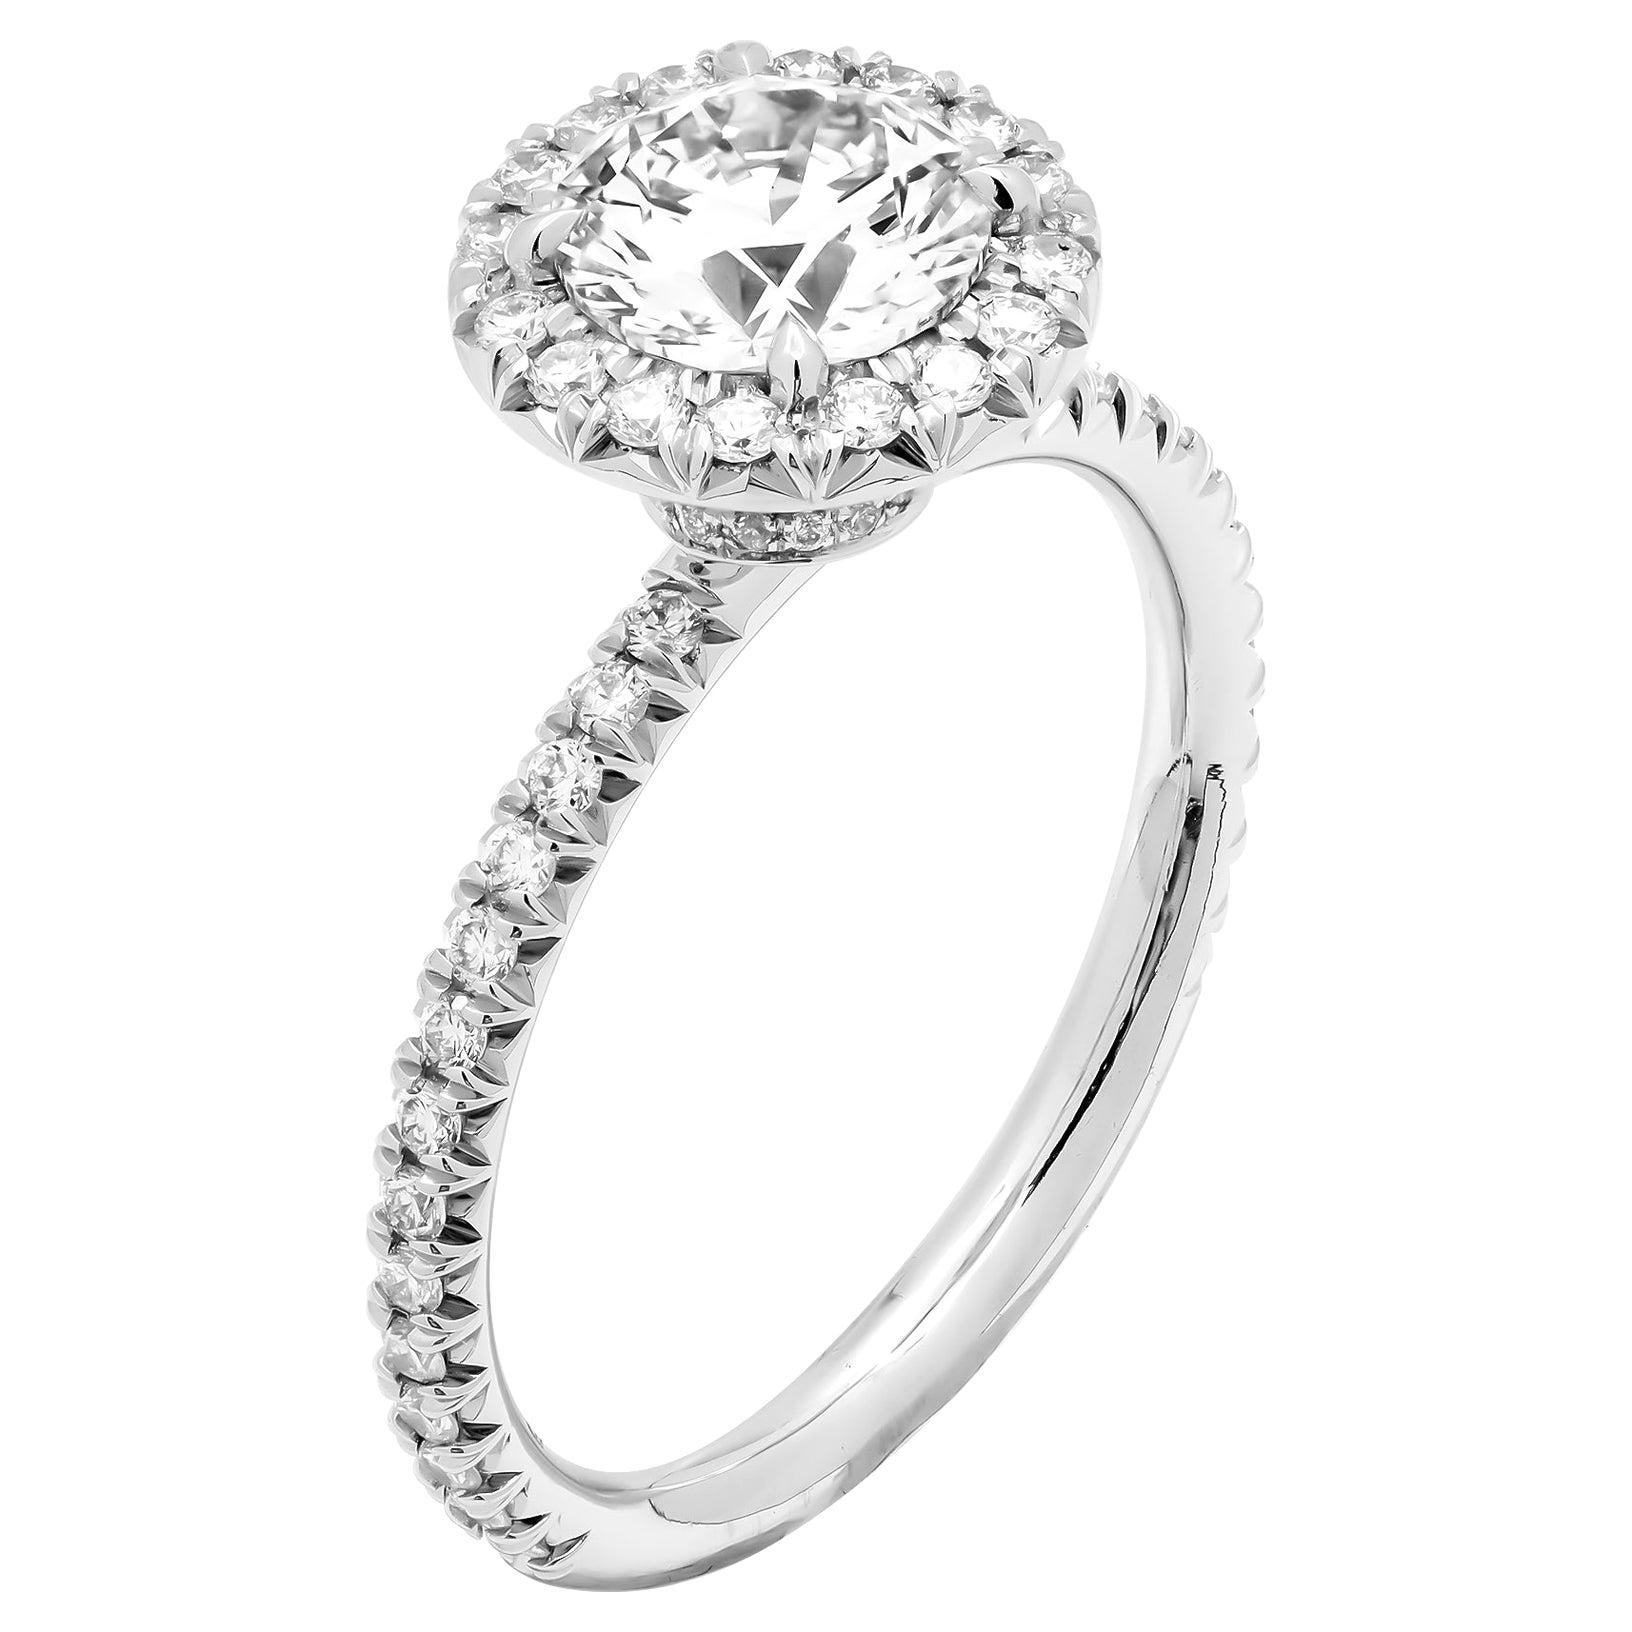 GIA Certified 1.02 Carat H VS2 Round Cut Diamond Engagement Ring